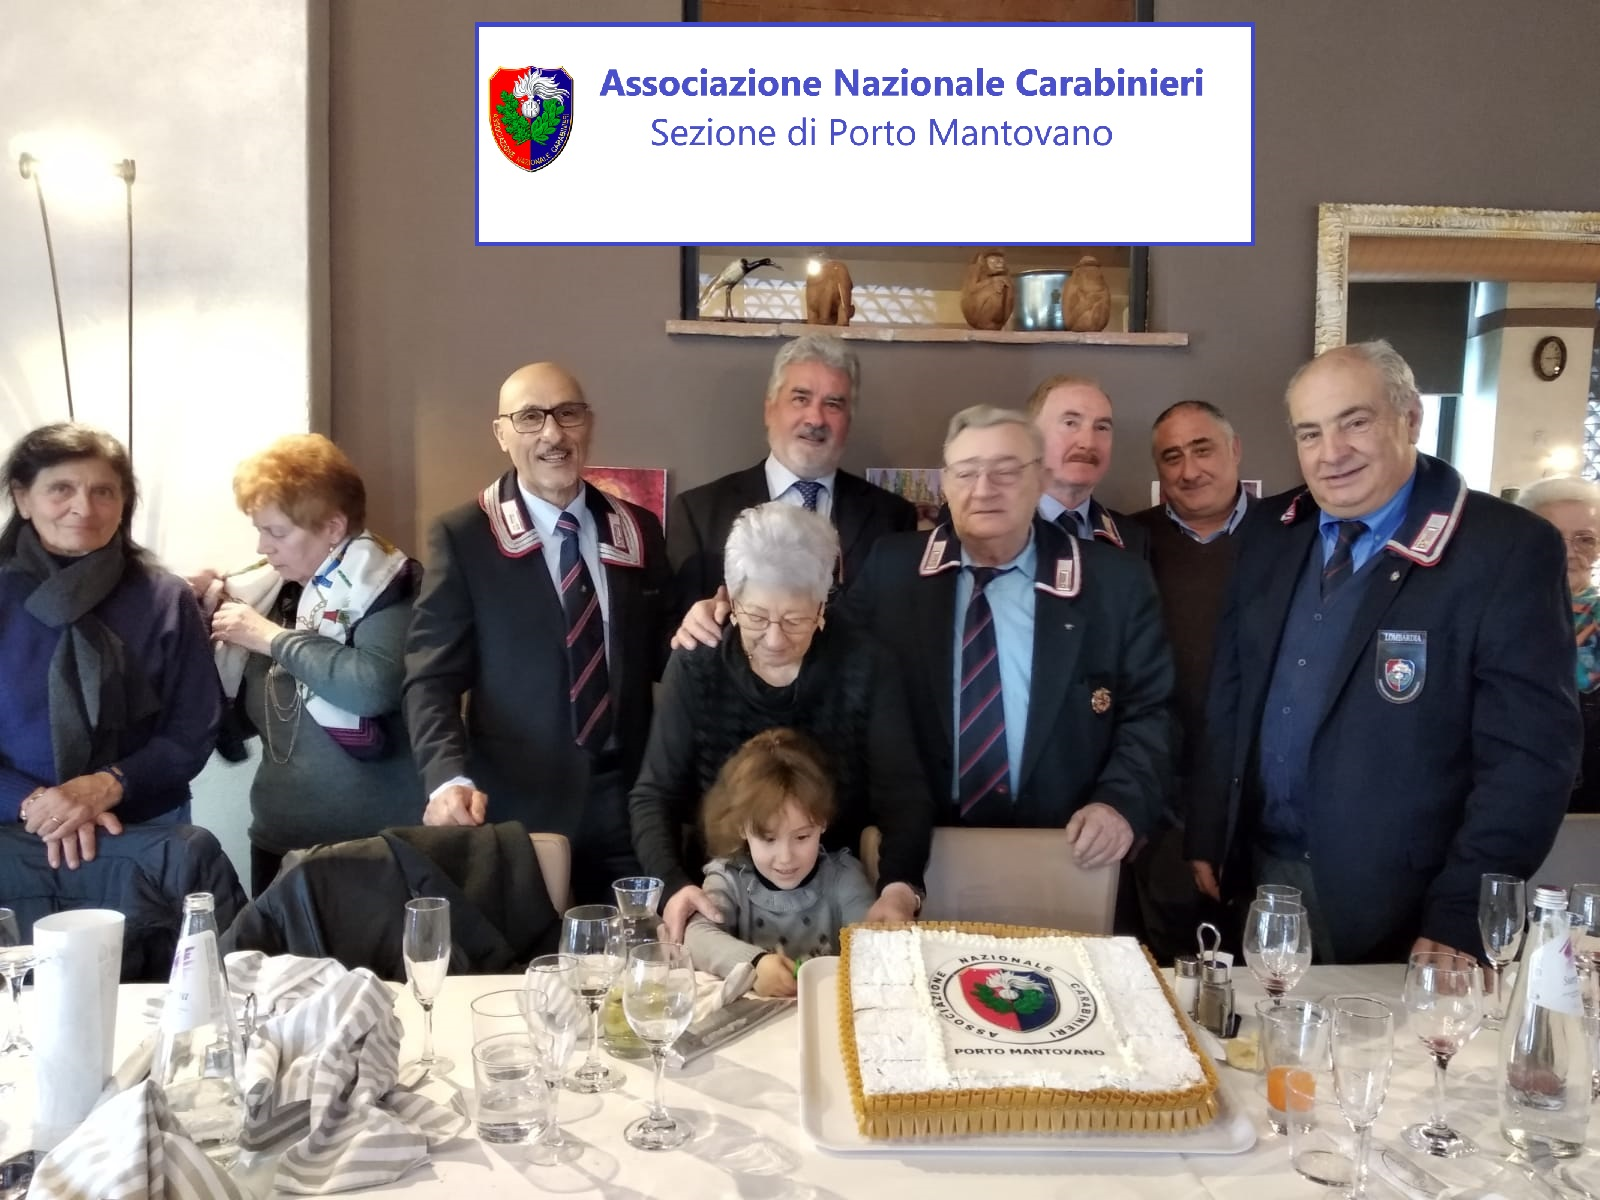 FOTO 2019 - ANC Porto Mantovano